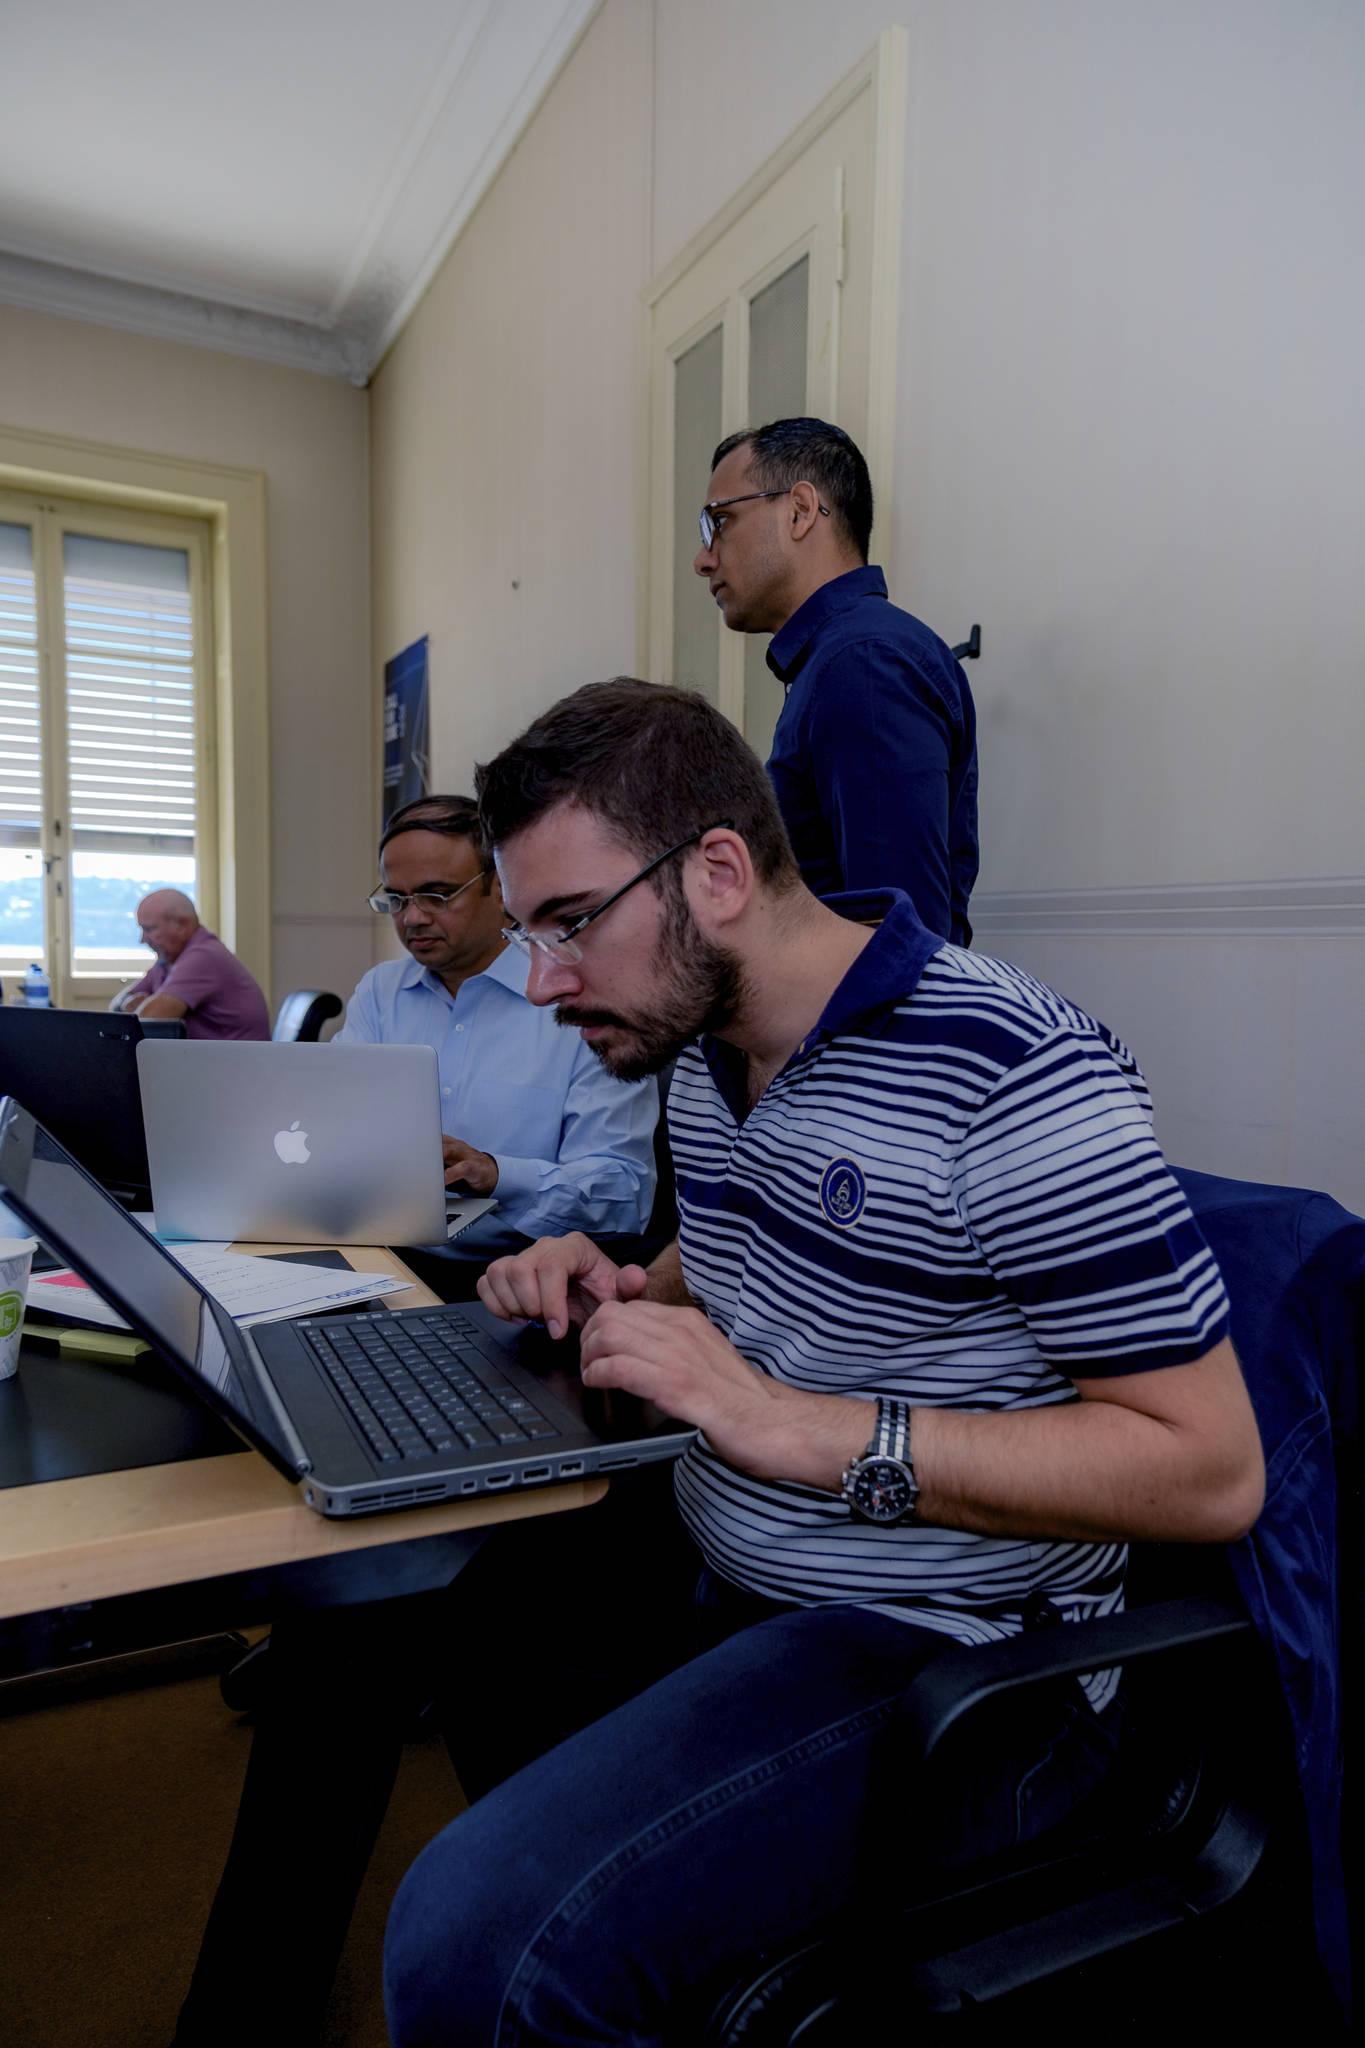 konstantinos team at work